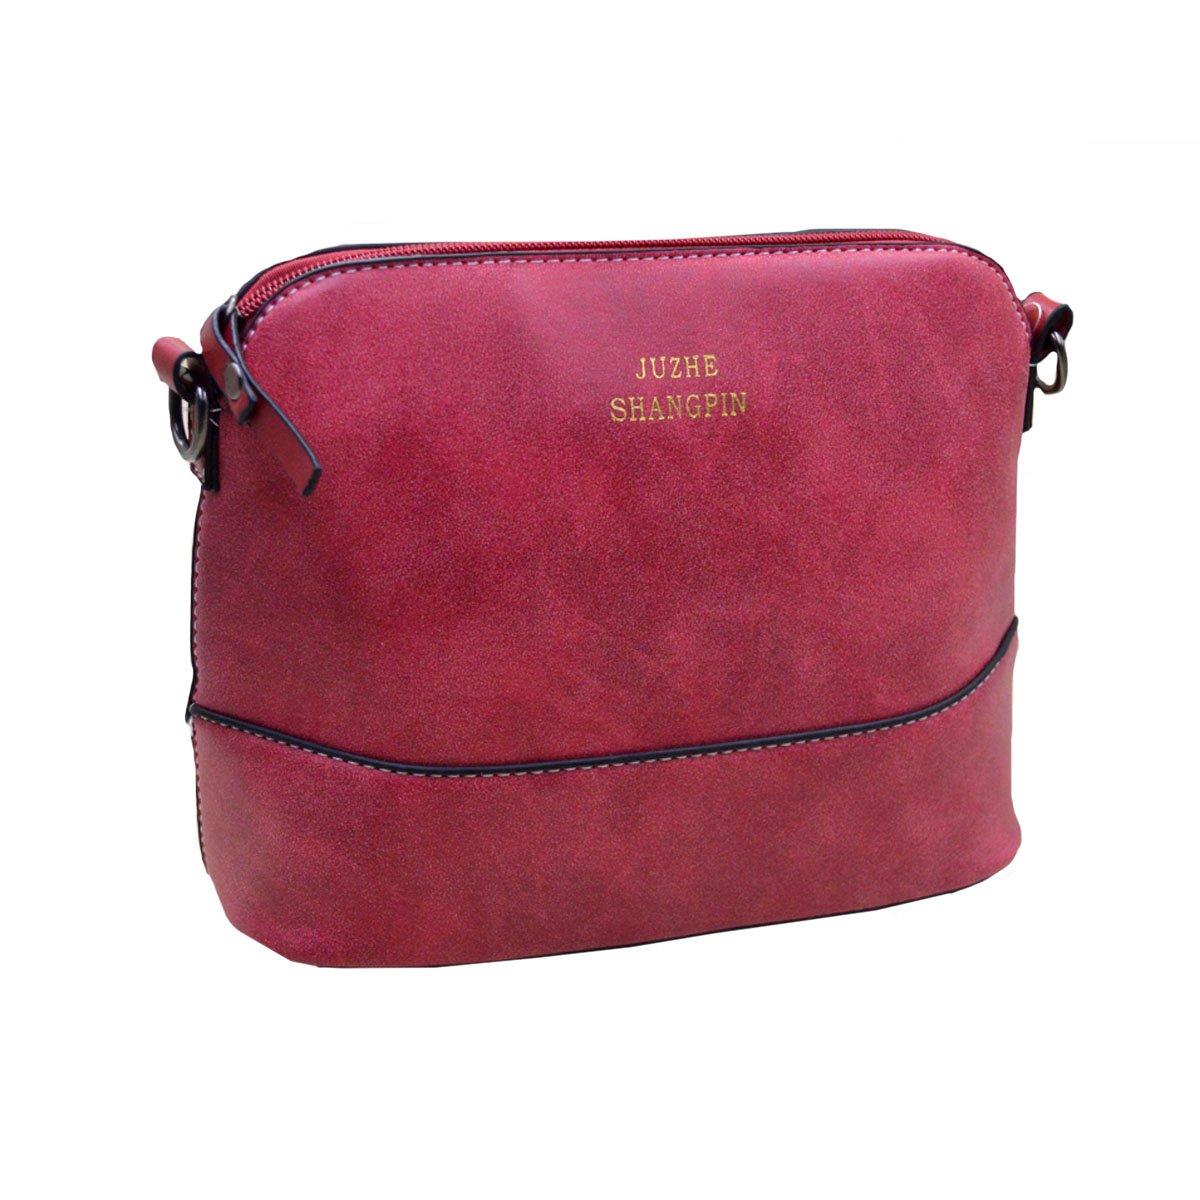 Felice Womens Small Satchel Handbag Purse Nubuck Suede Shoulder Bag with Zip-Top (red)